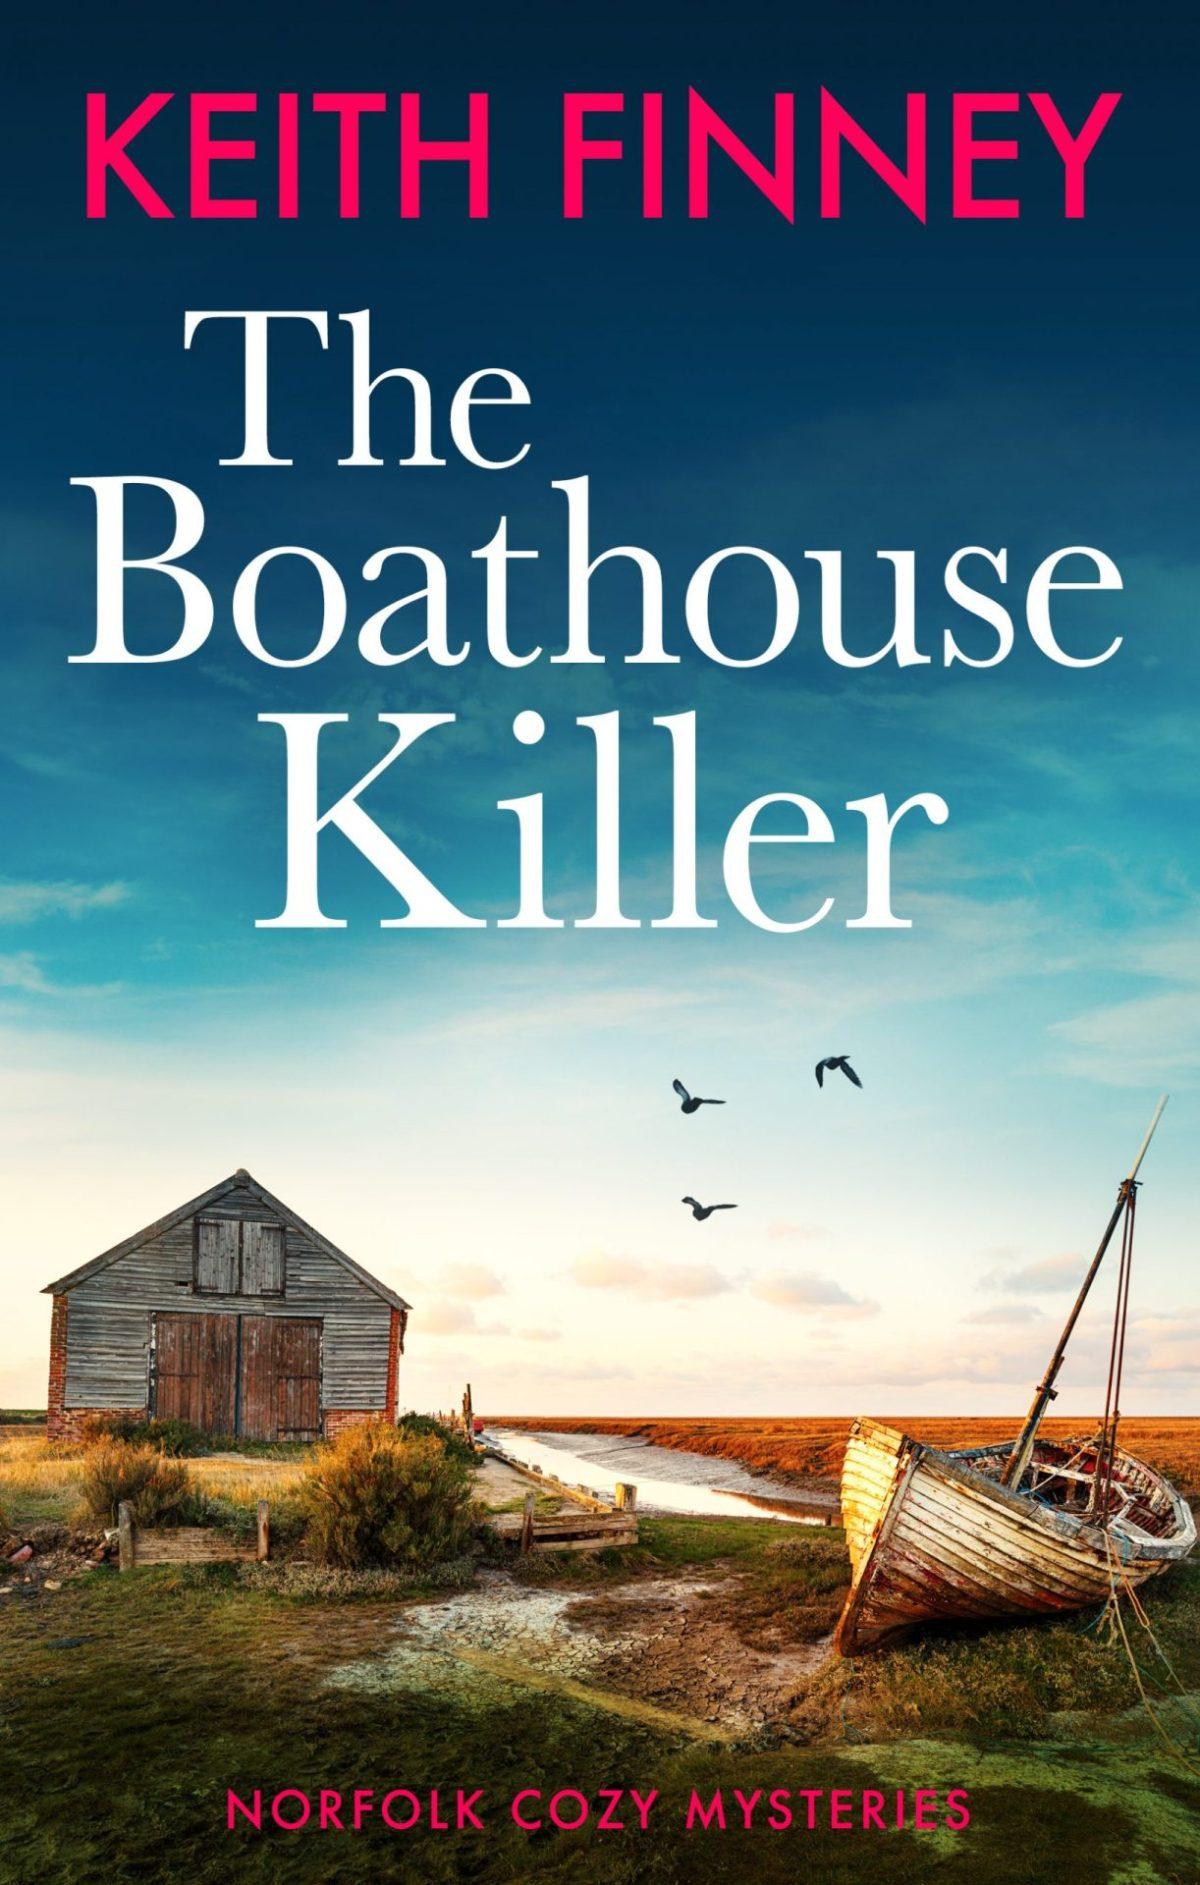 The Boathouse Killer